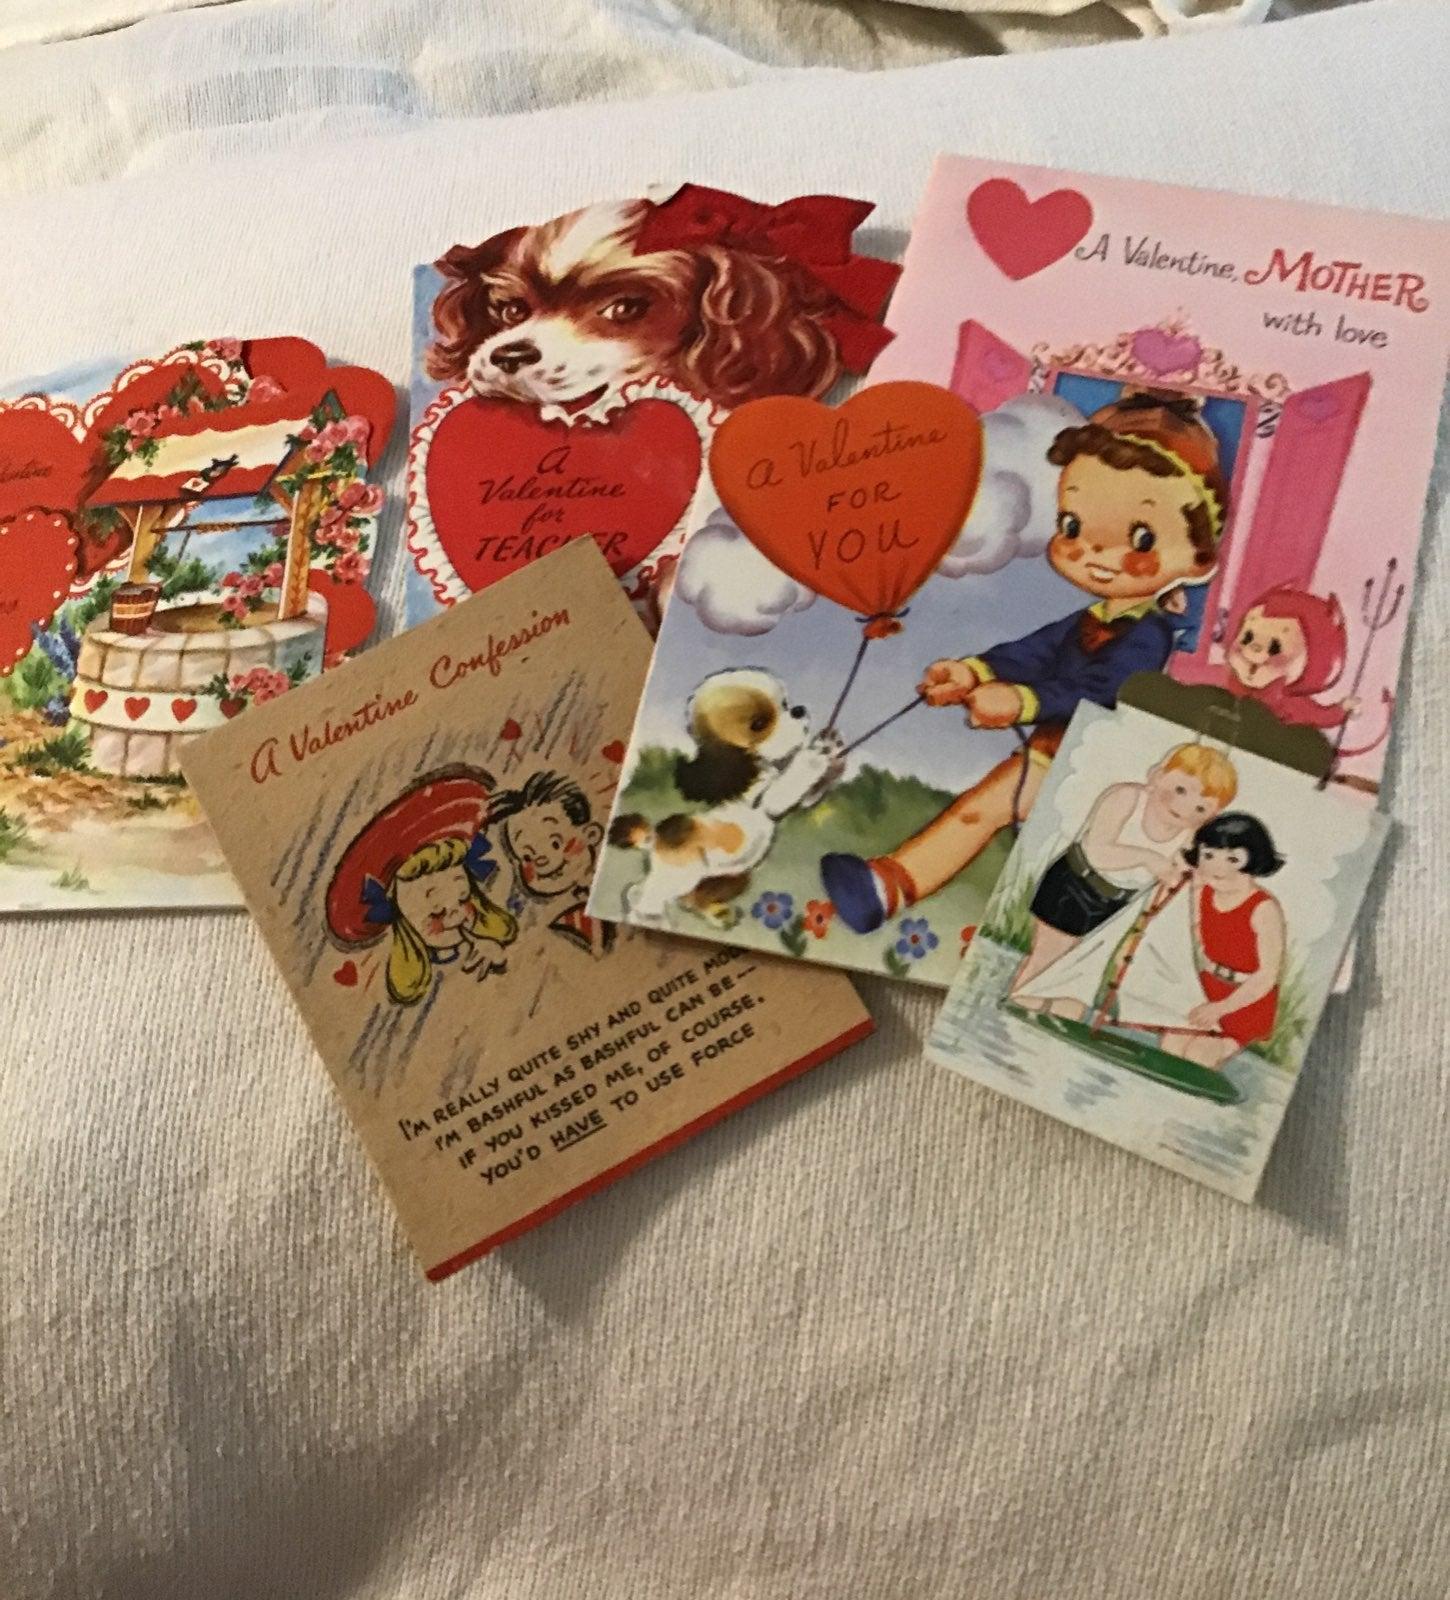 Cards,greeting,Valentines,vintage 5cards